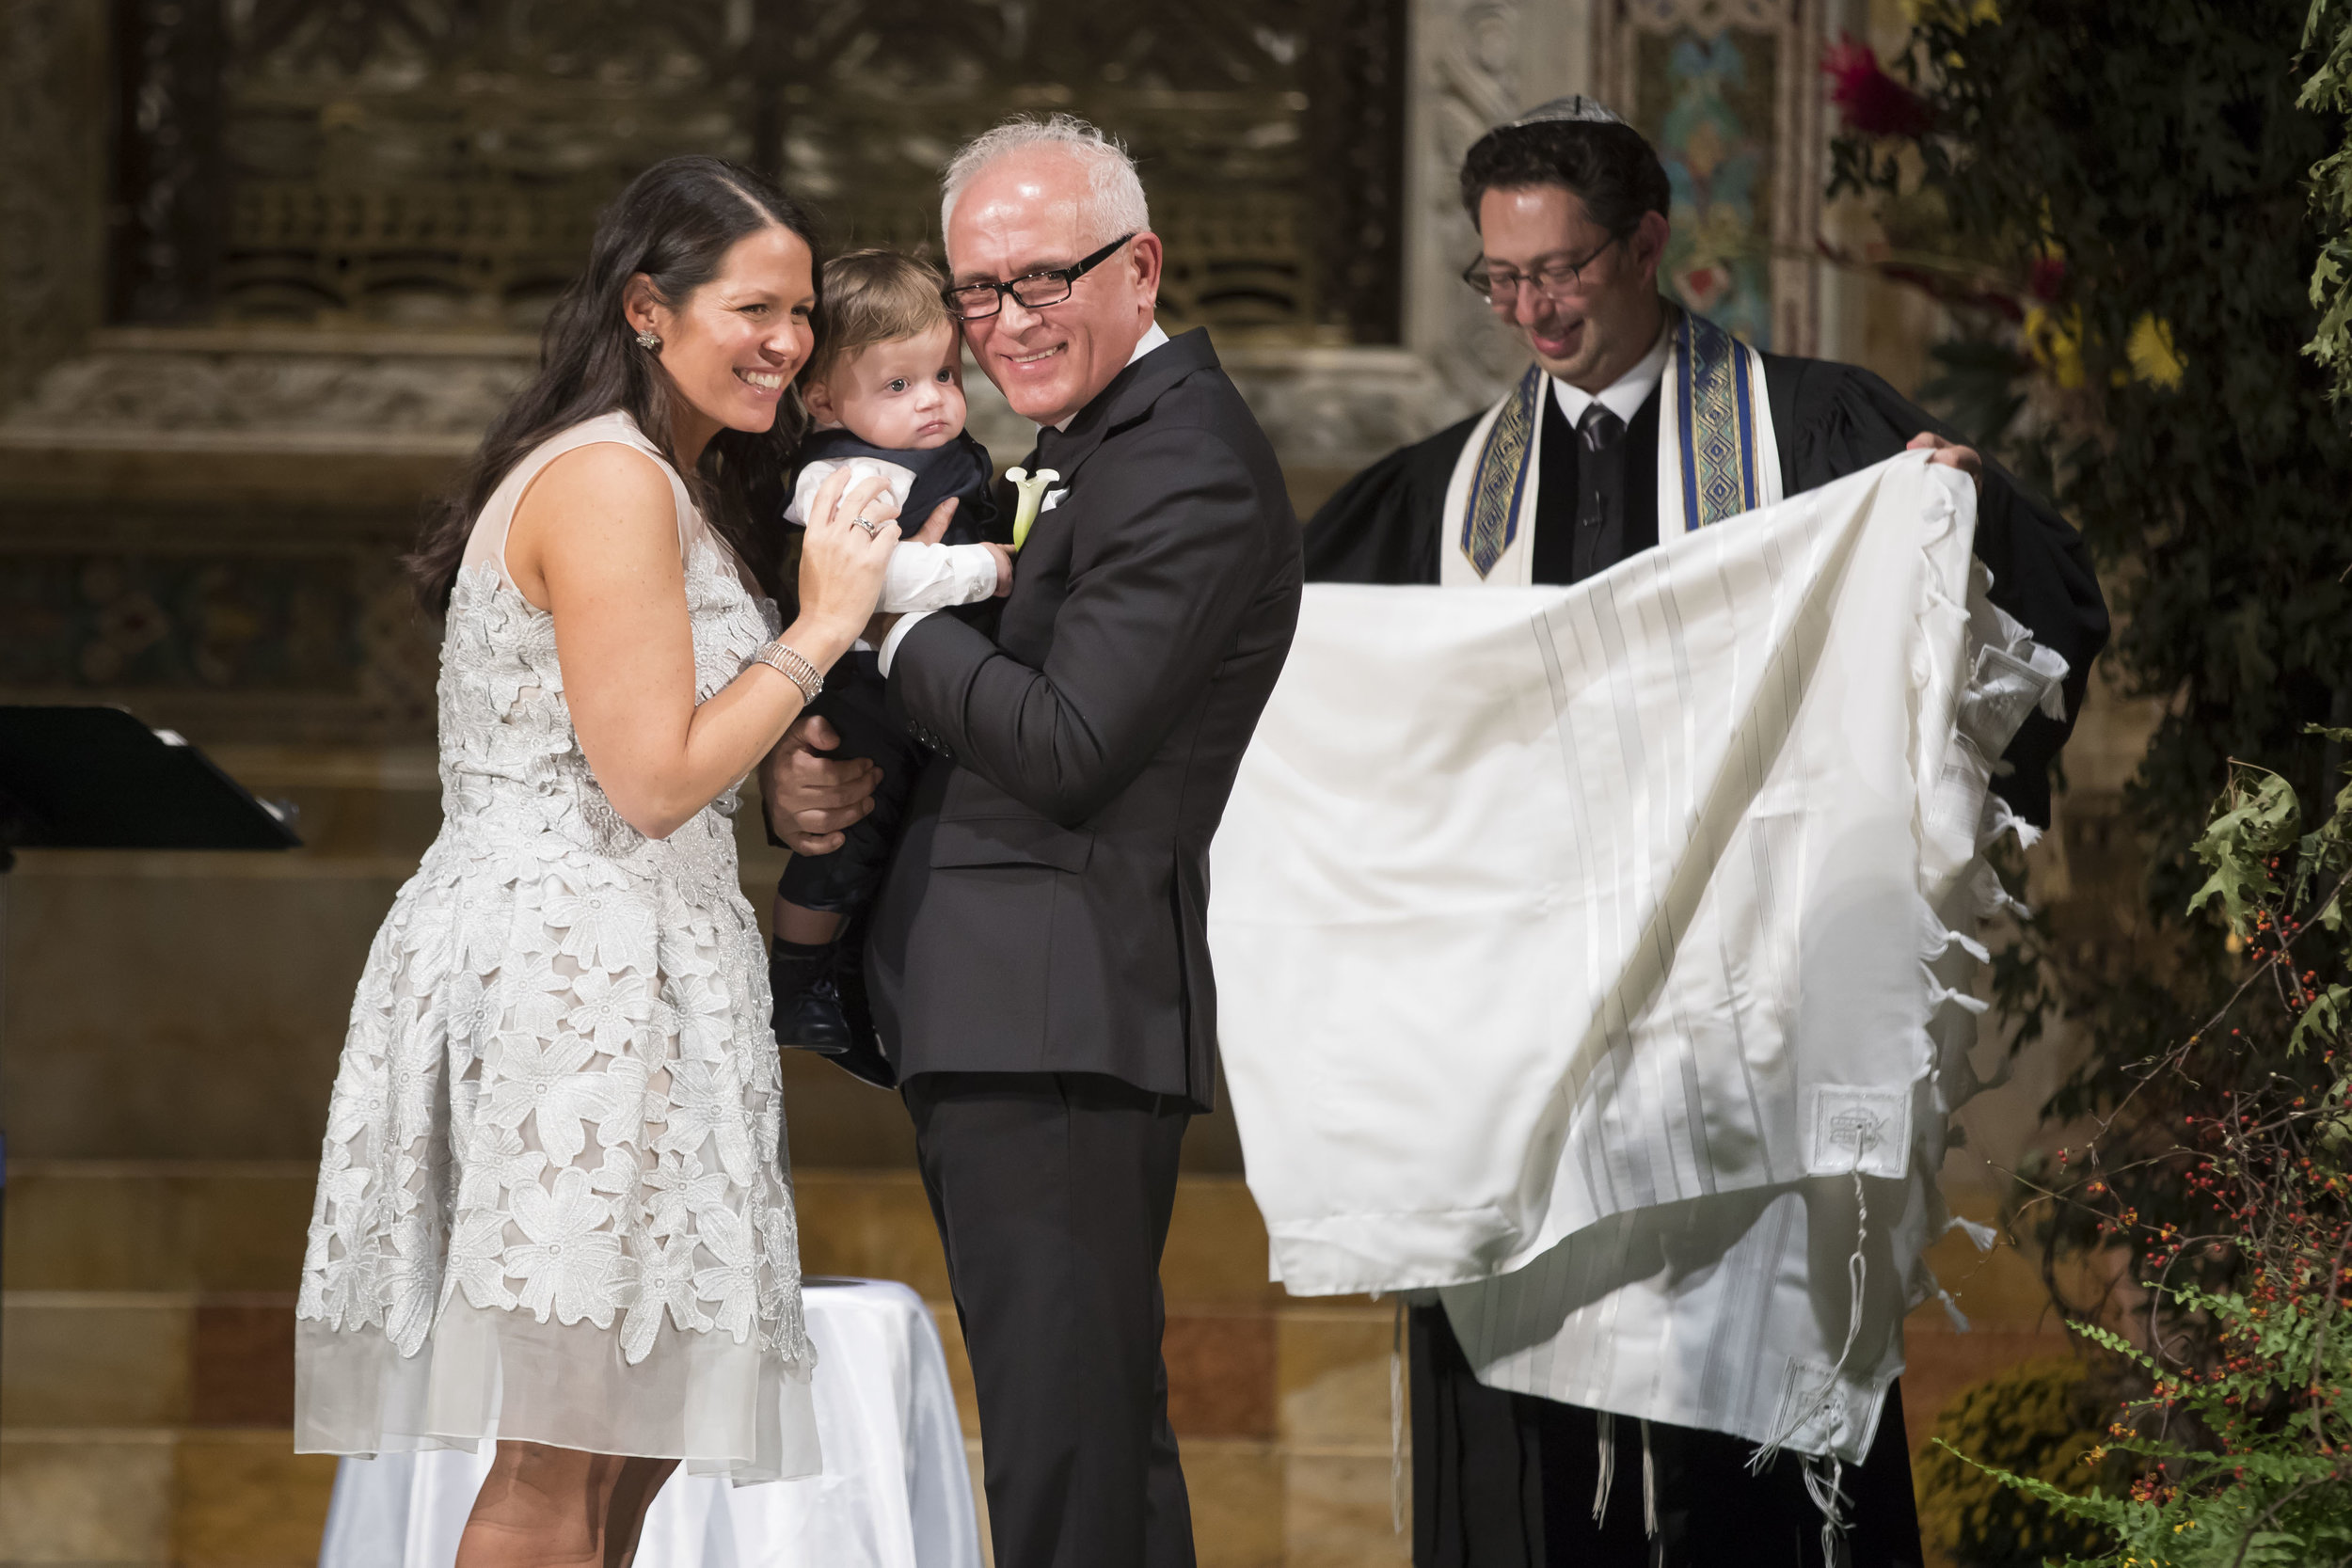 synagogue-wedding-photographer-1233.JPG